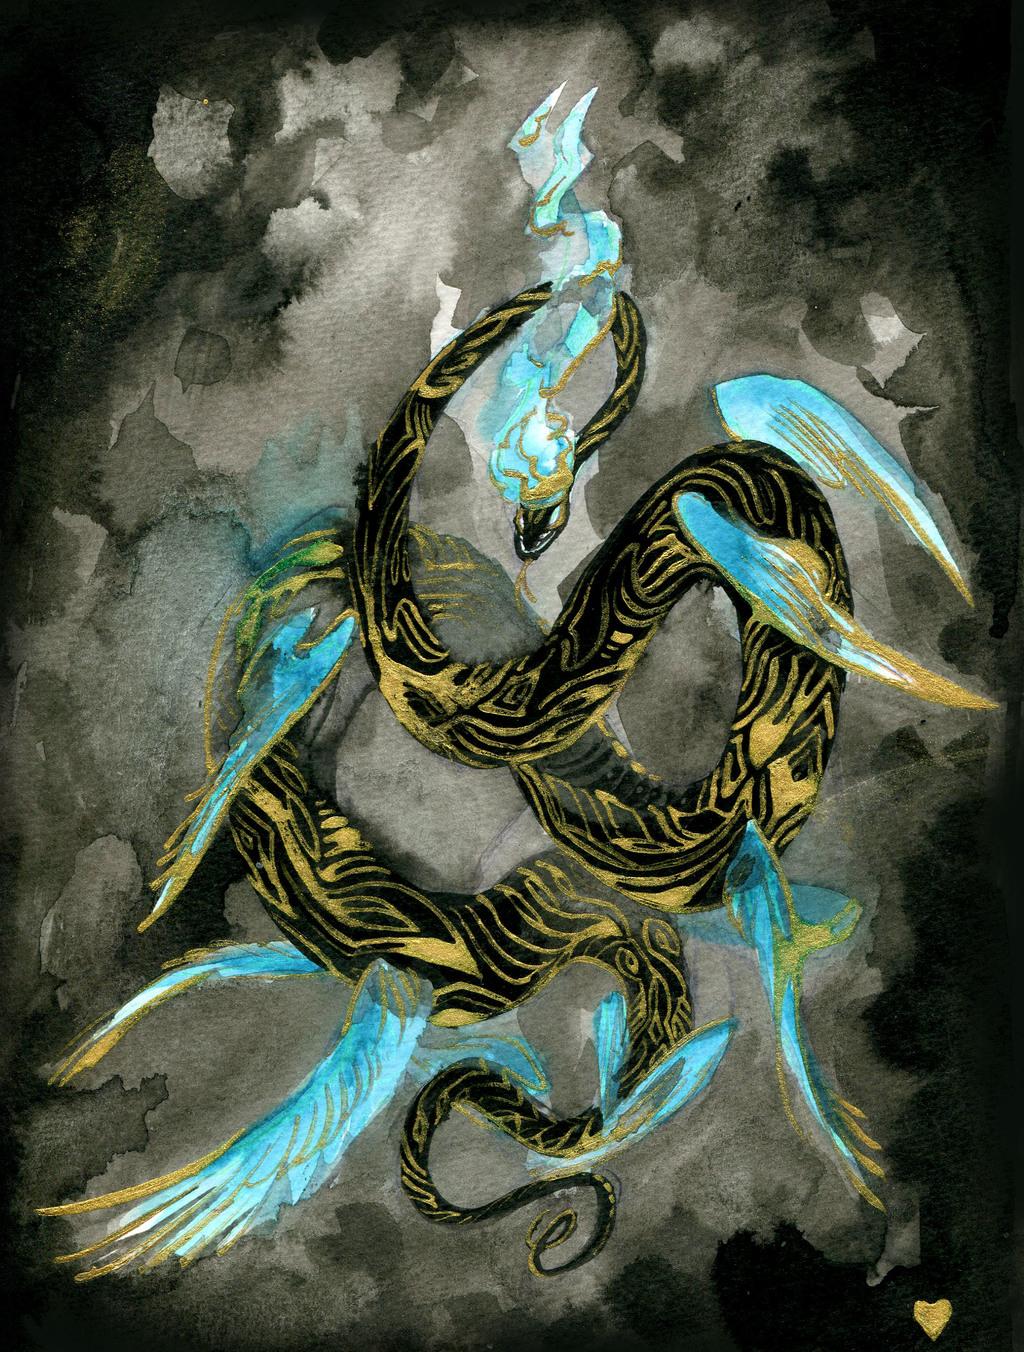 Kyu the Cosmic